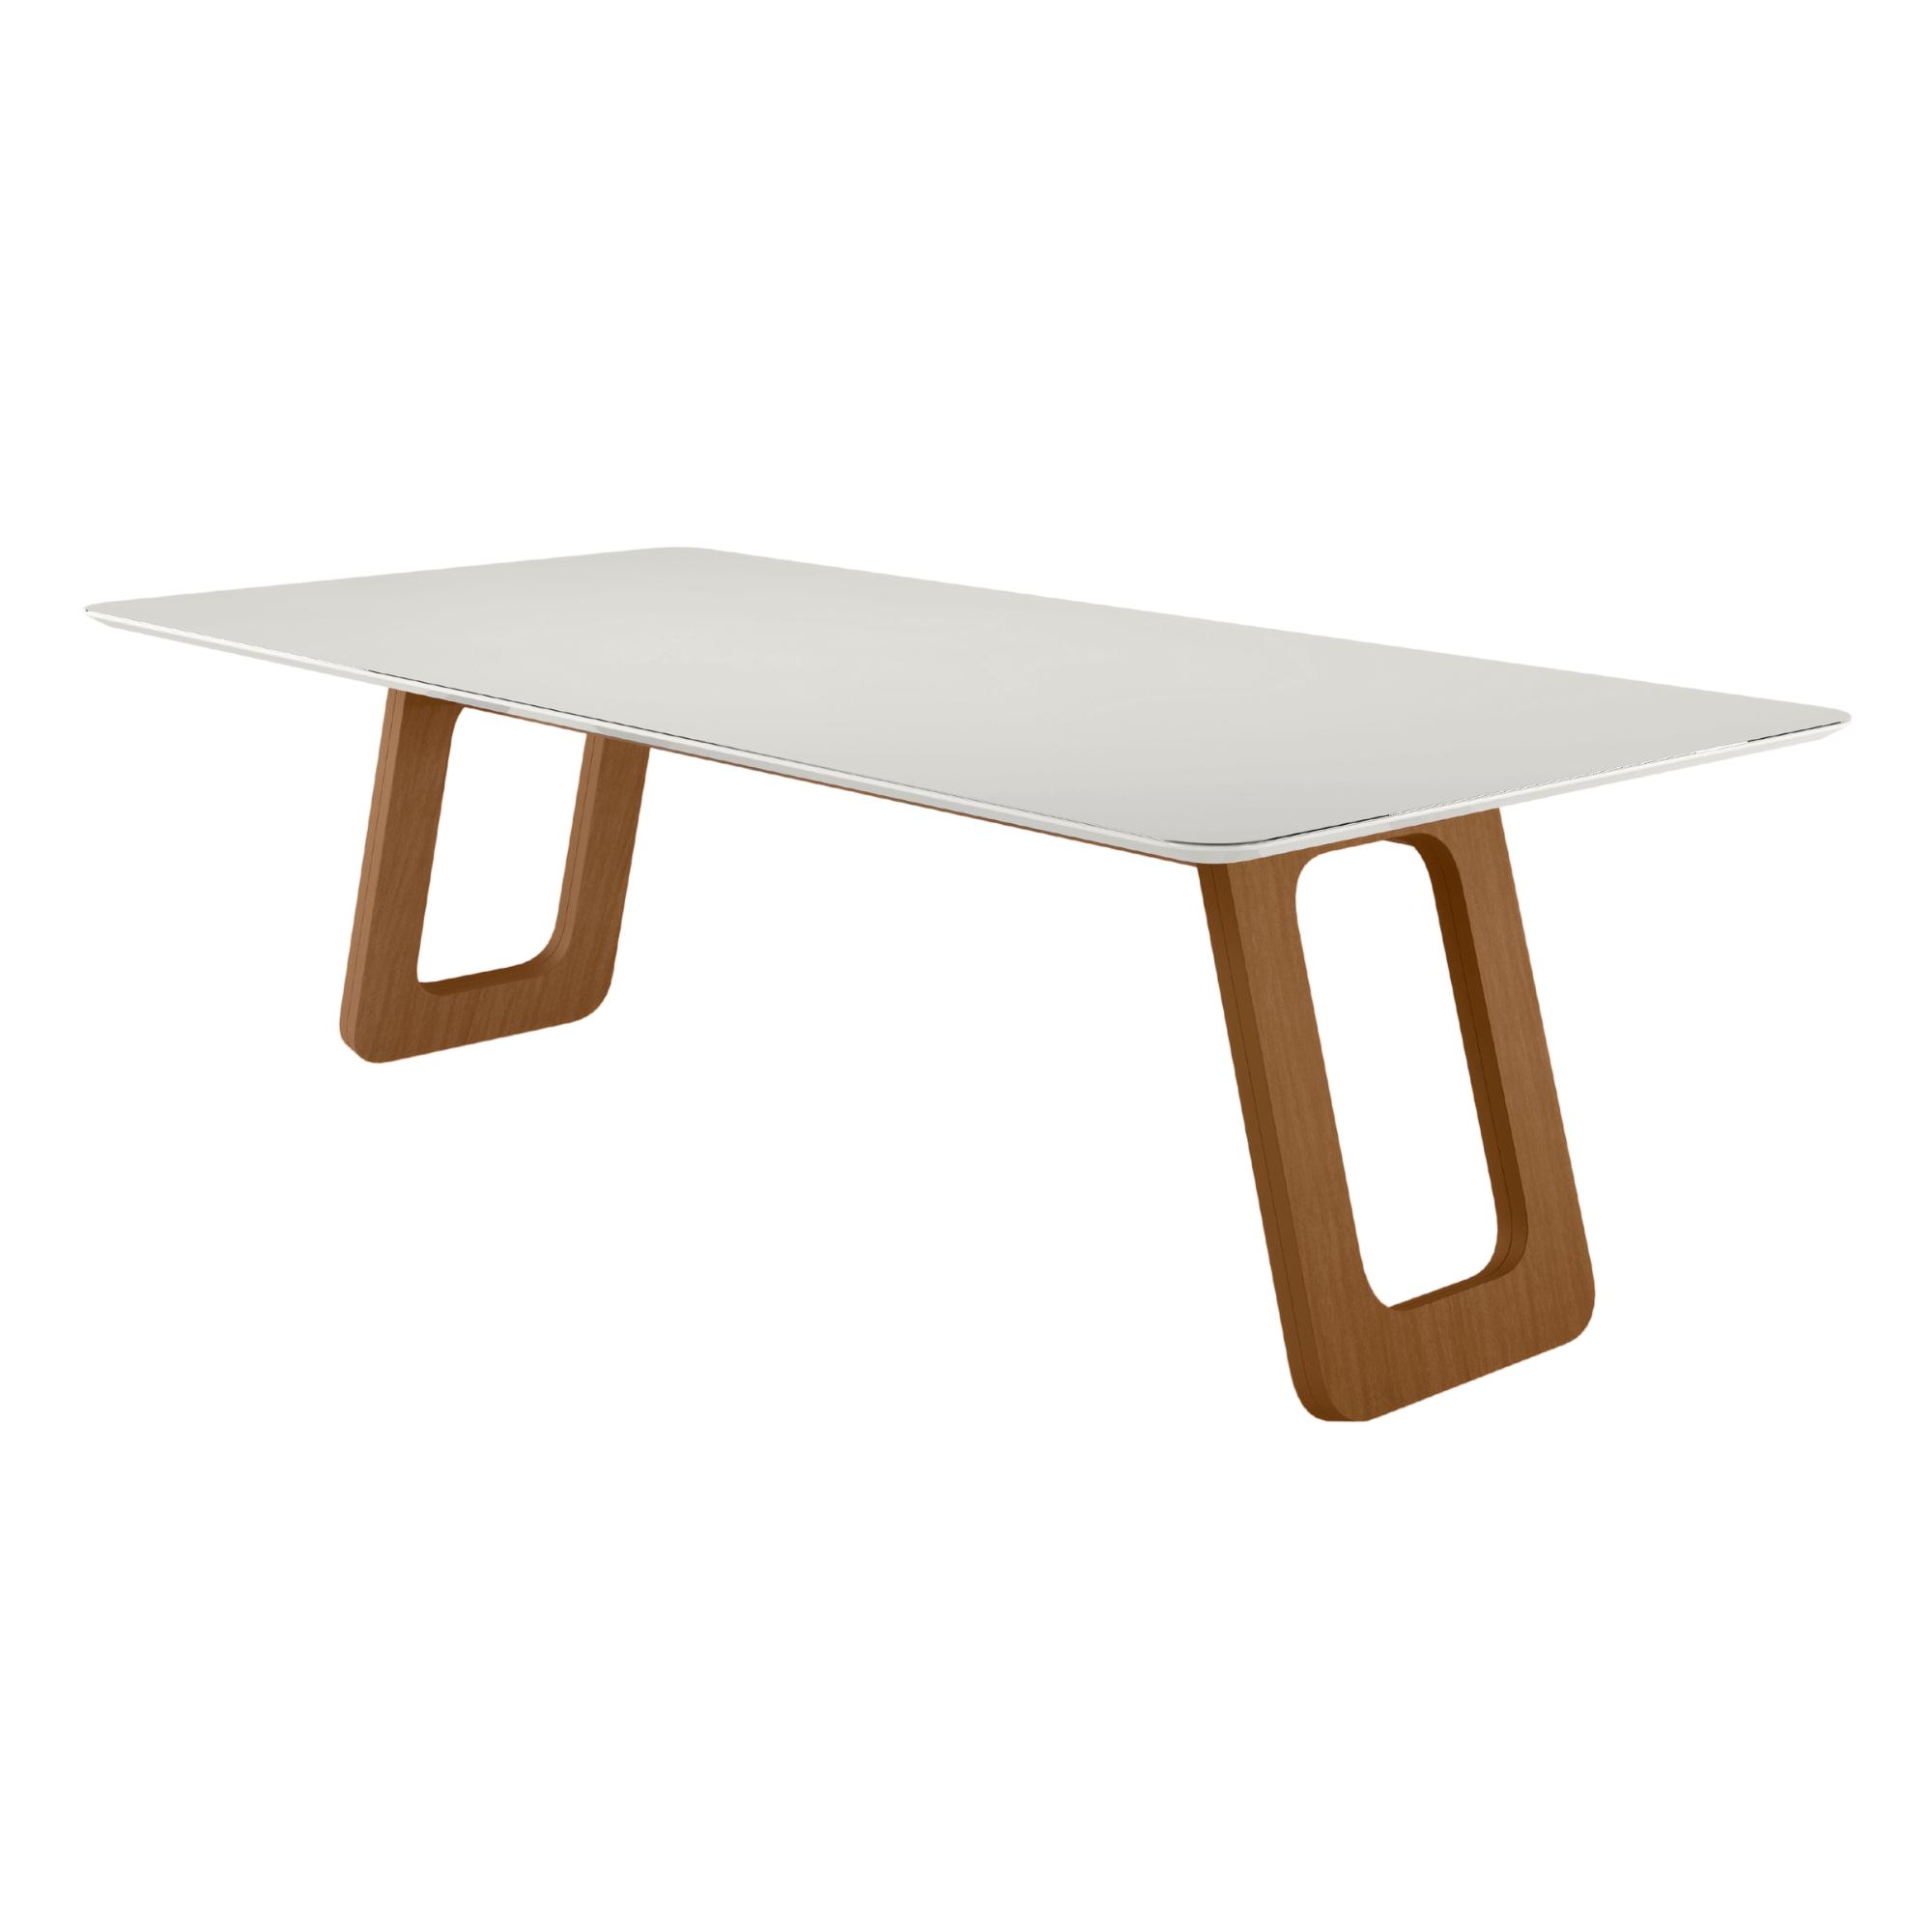 Mesa de Jantar 8 Lugares Retangular Oslo 200 cm x 100 cm